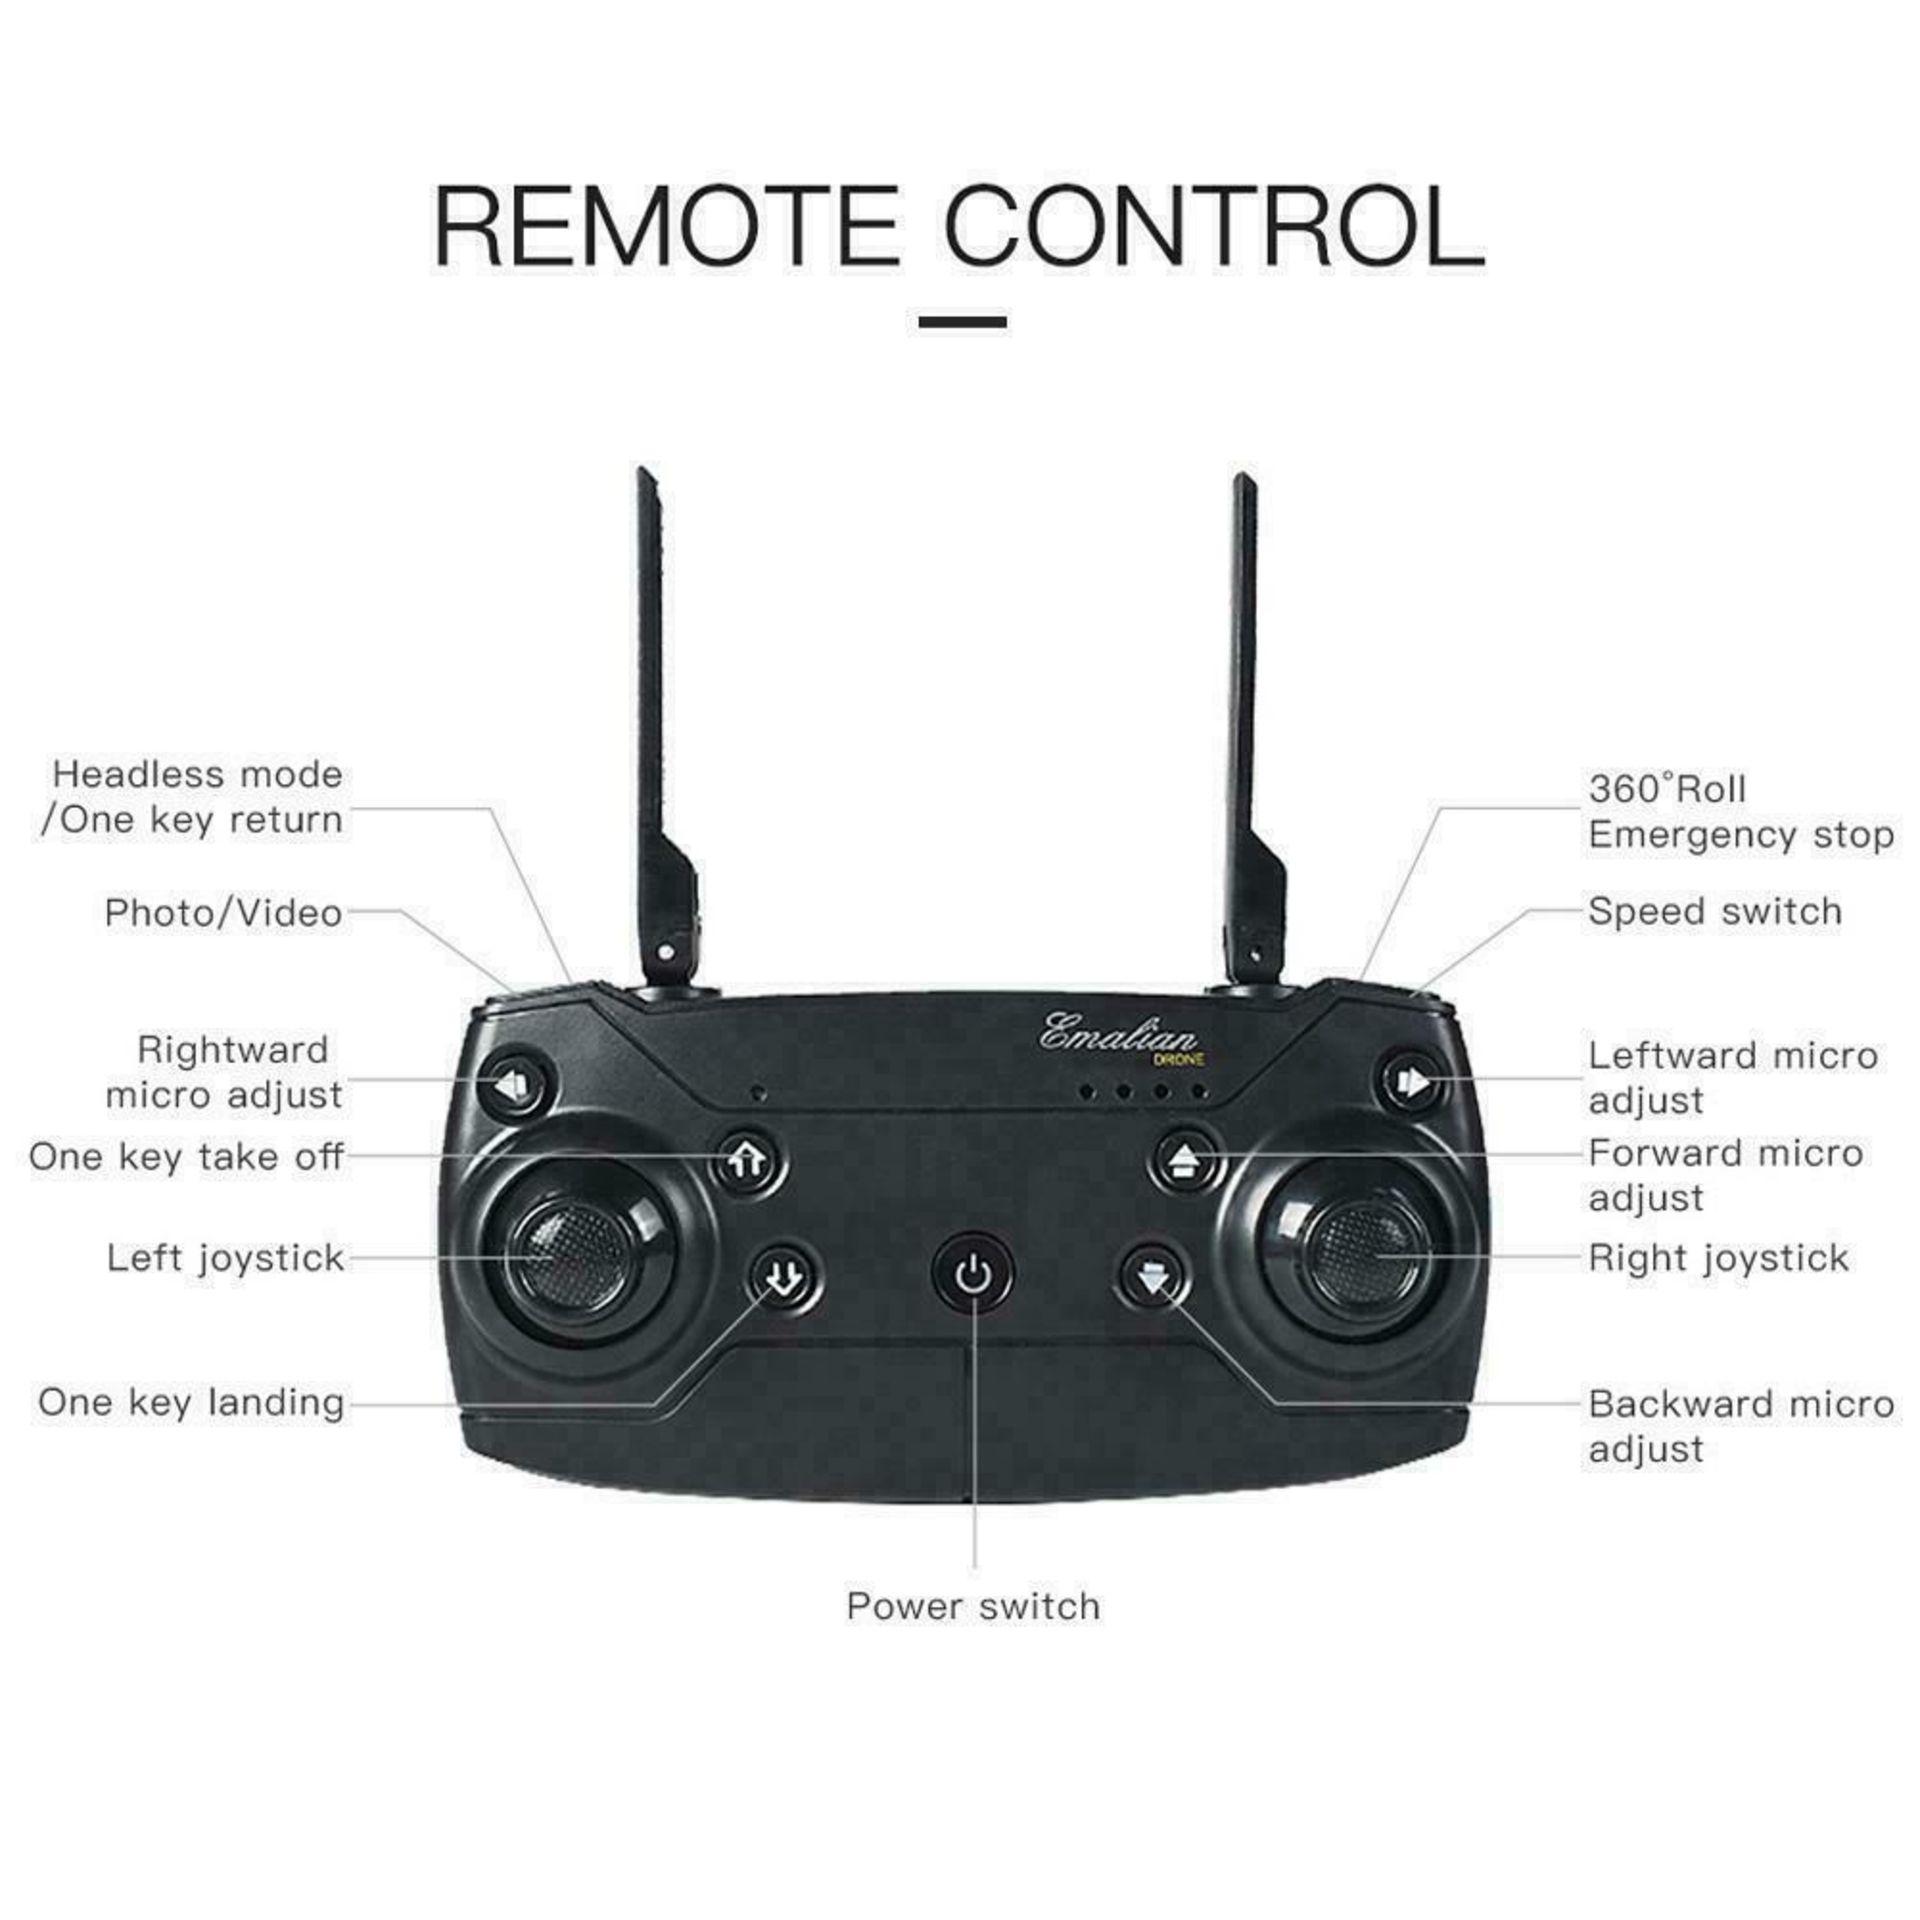 NEW & UNUSED DRONE X PRO WIFI FPV 1080P HD CAMERA FOLDABLE RC QUADCOPTER + BAG *PLUS VAT* - Image 2 of 9